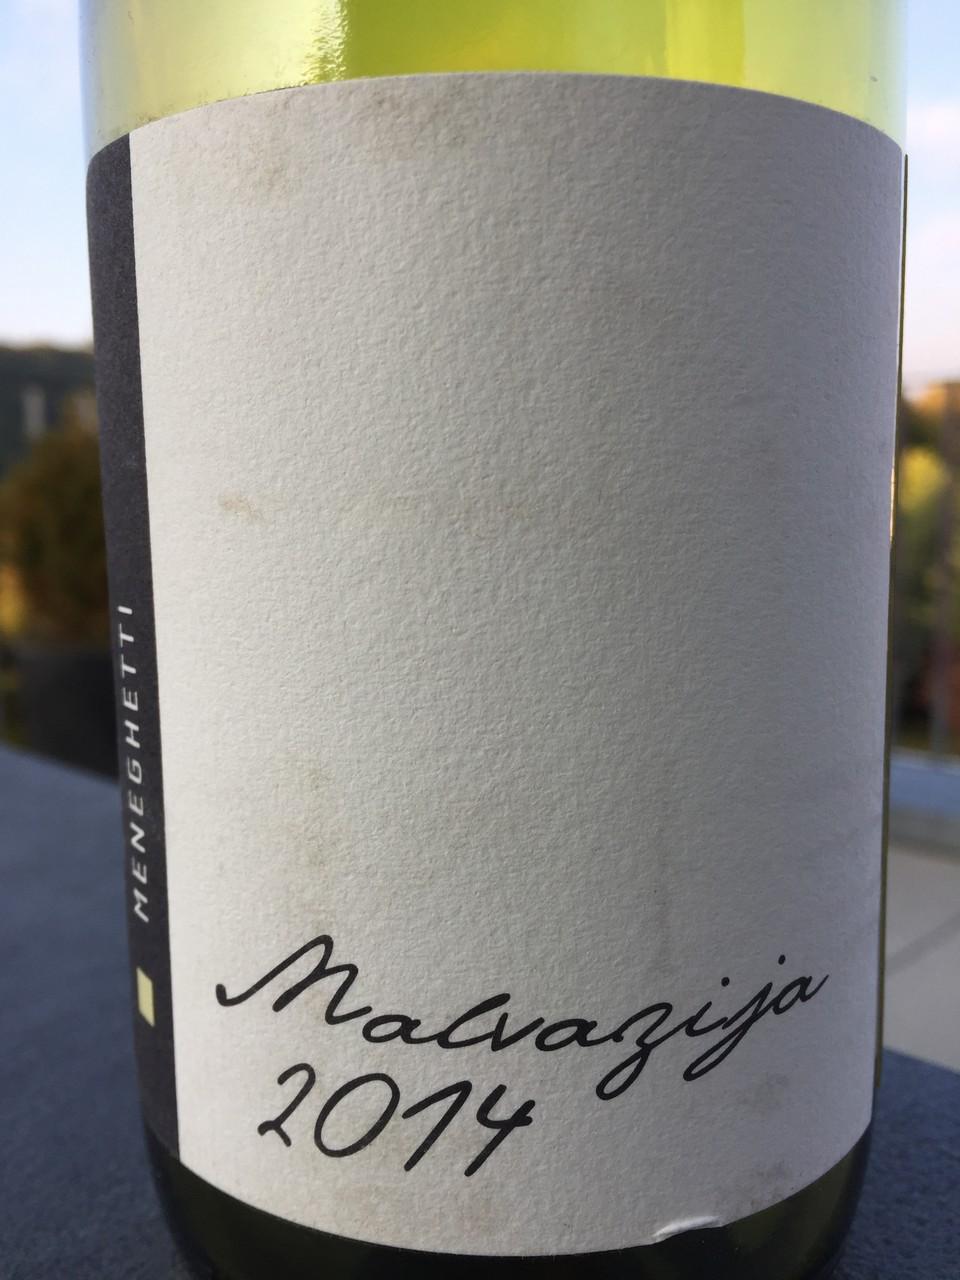 Malvazija, Meneghetti, 2014